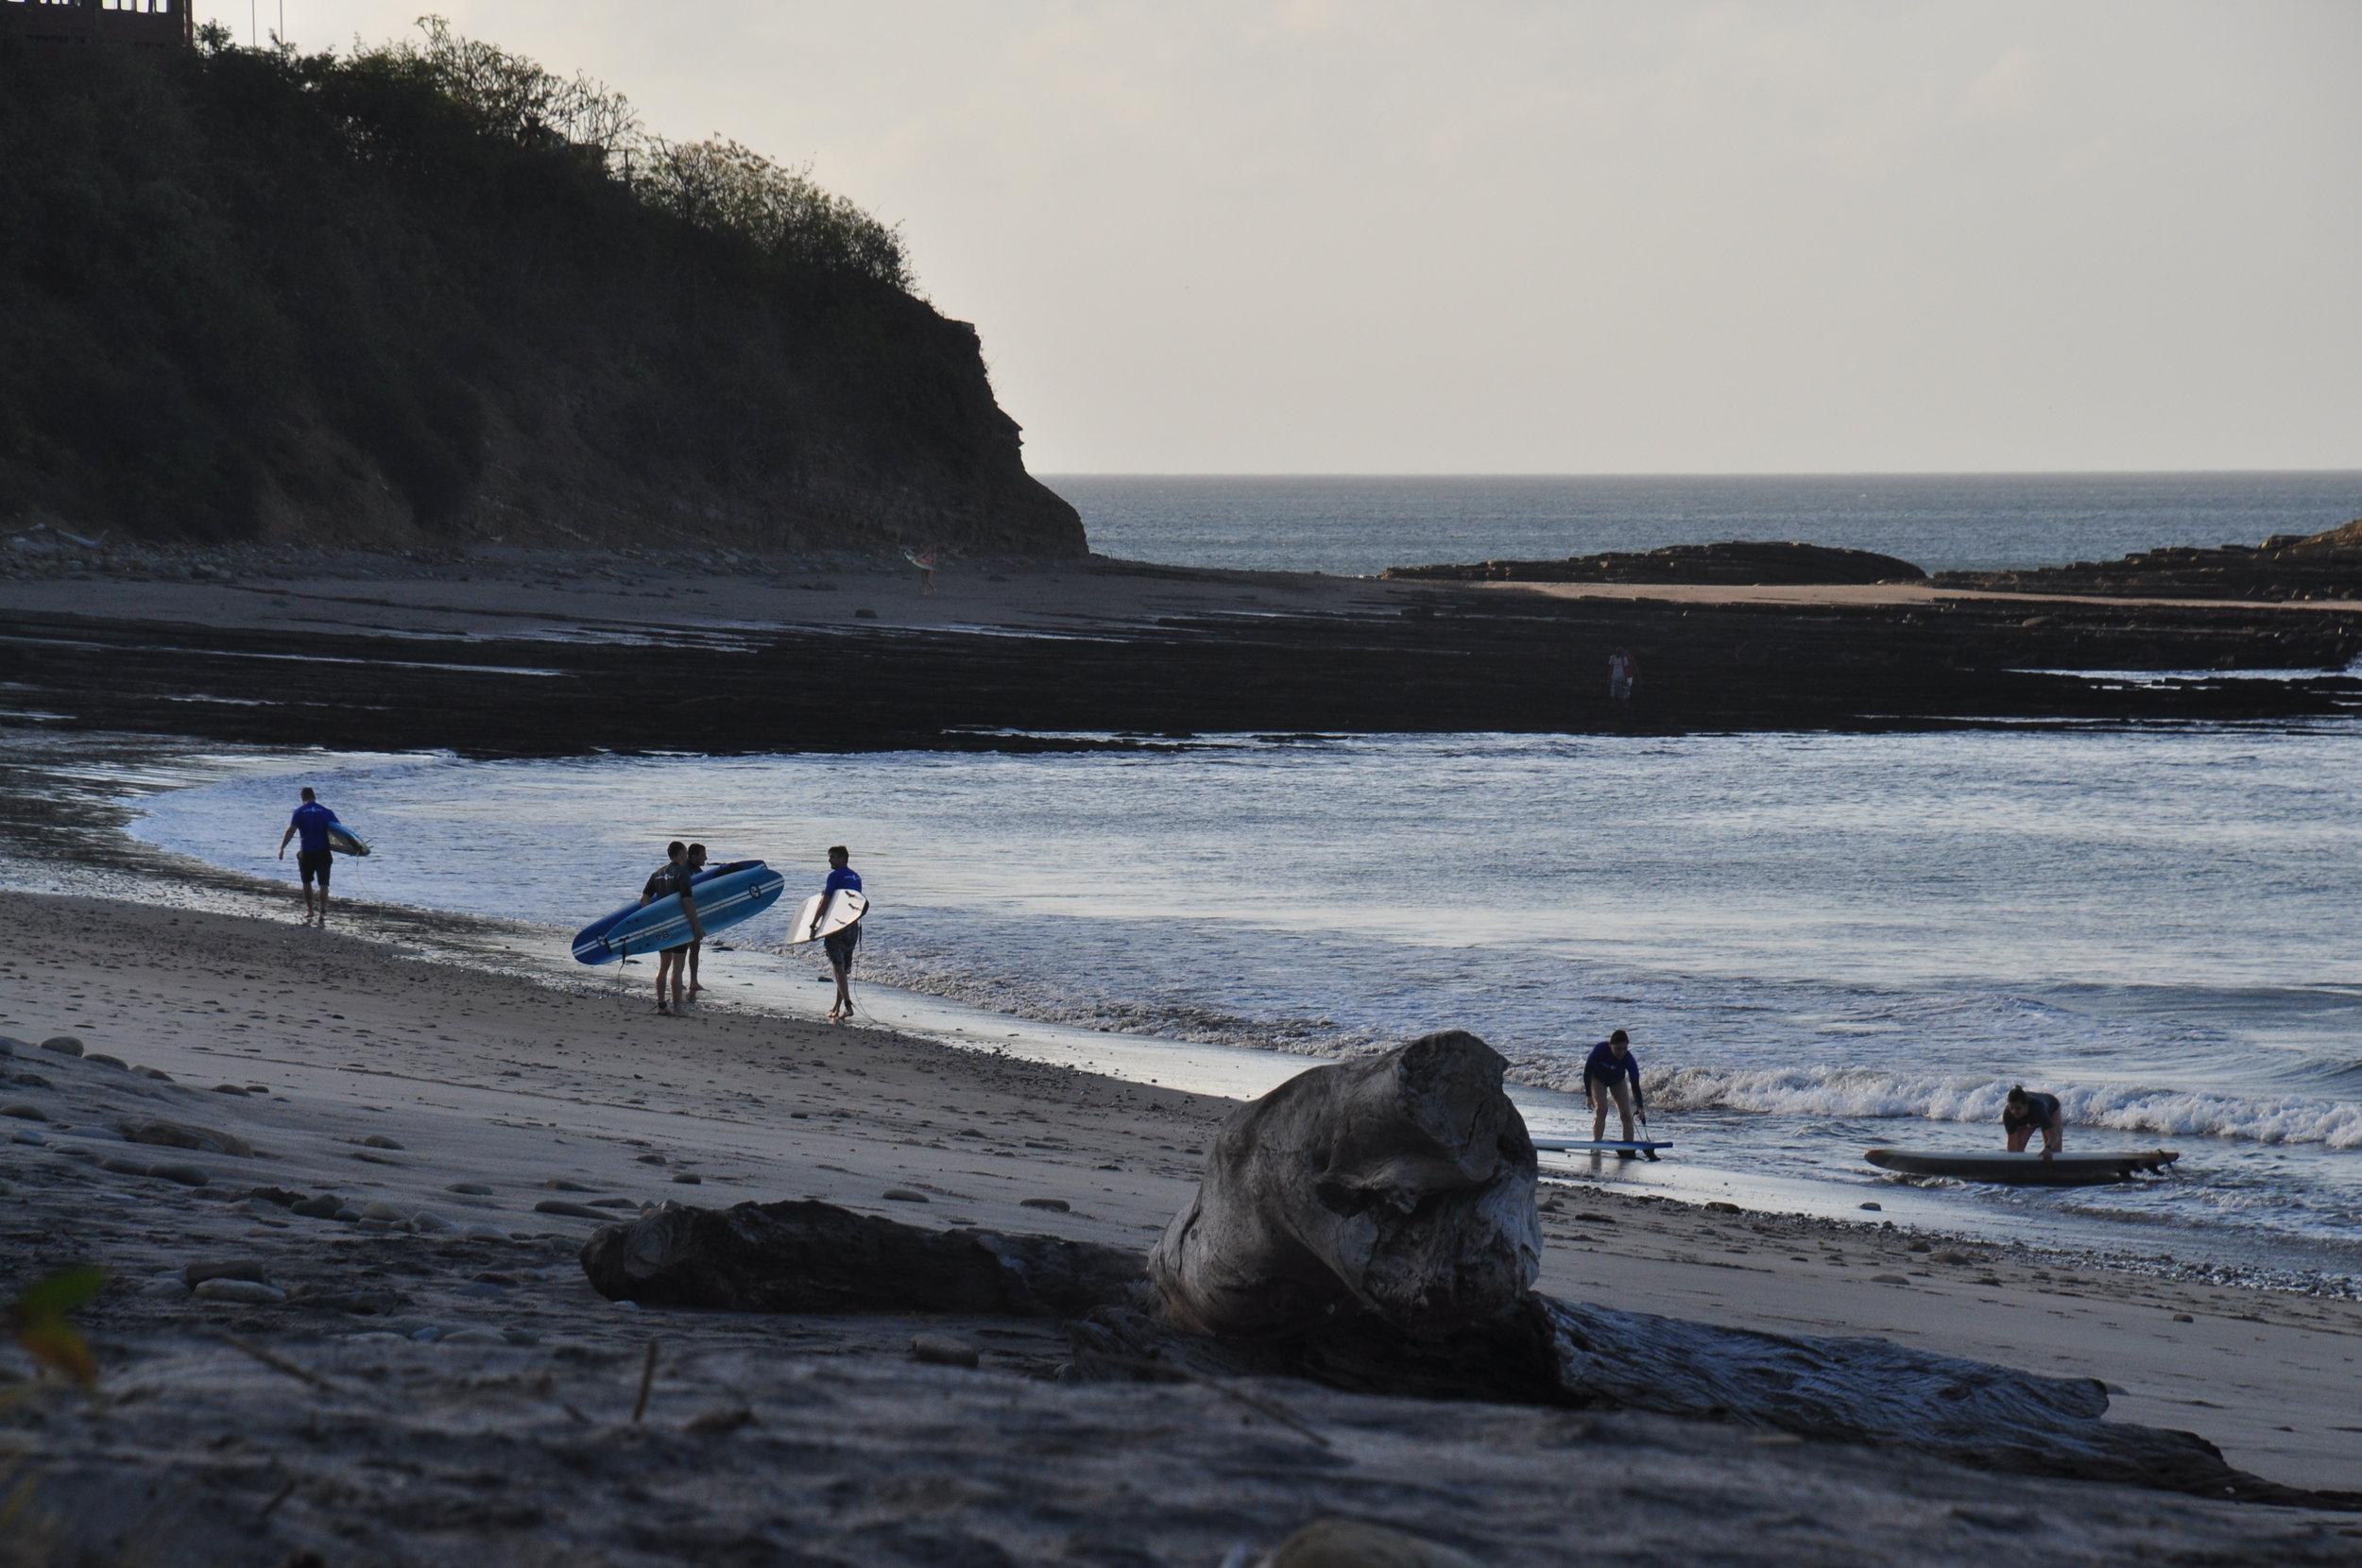 Sunrise surf session